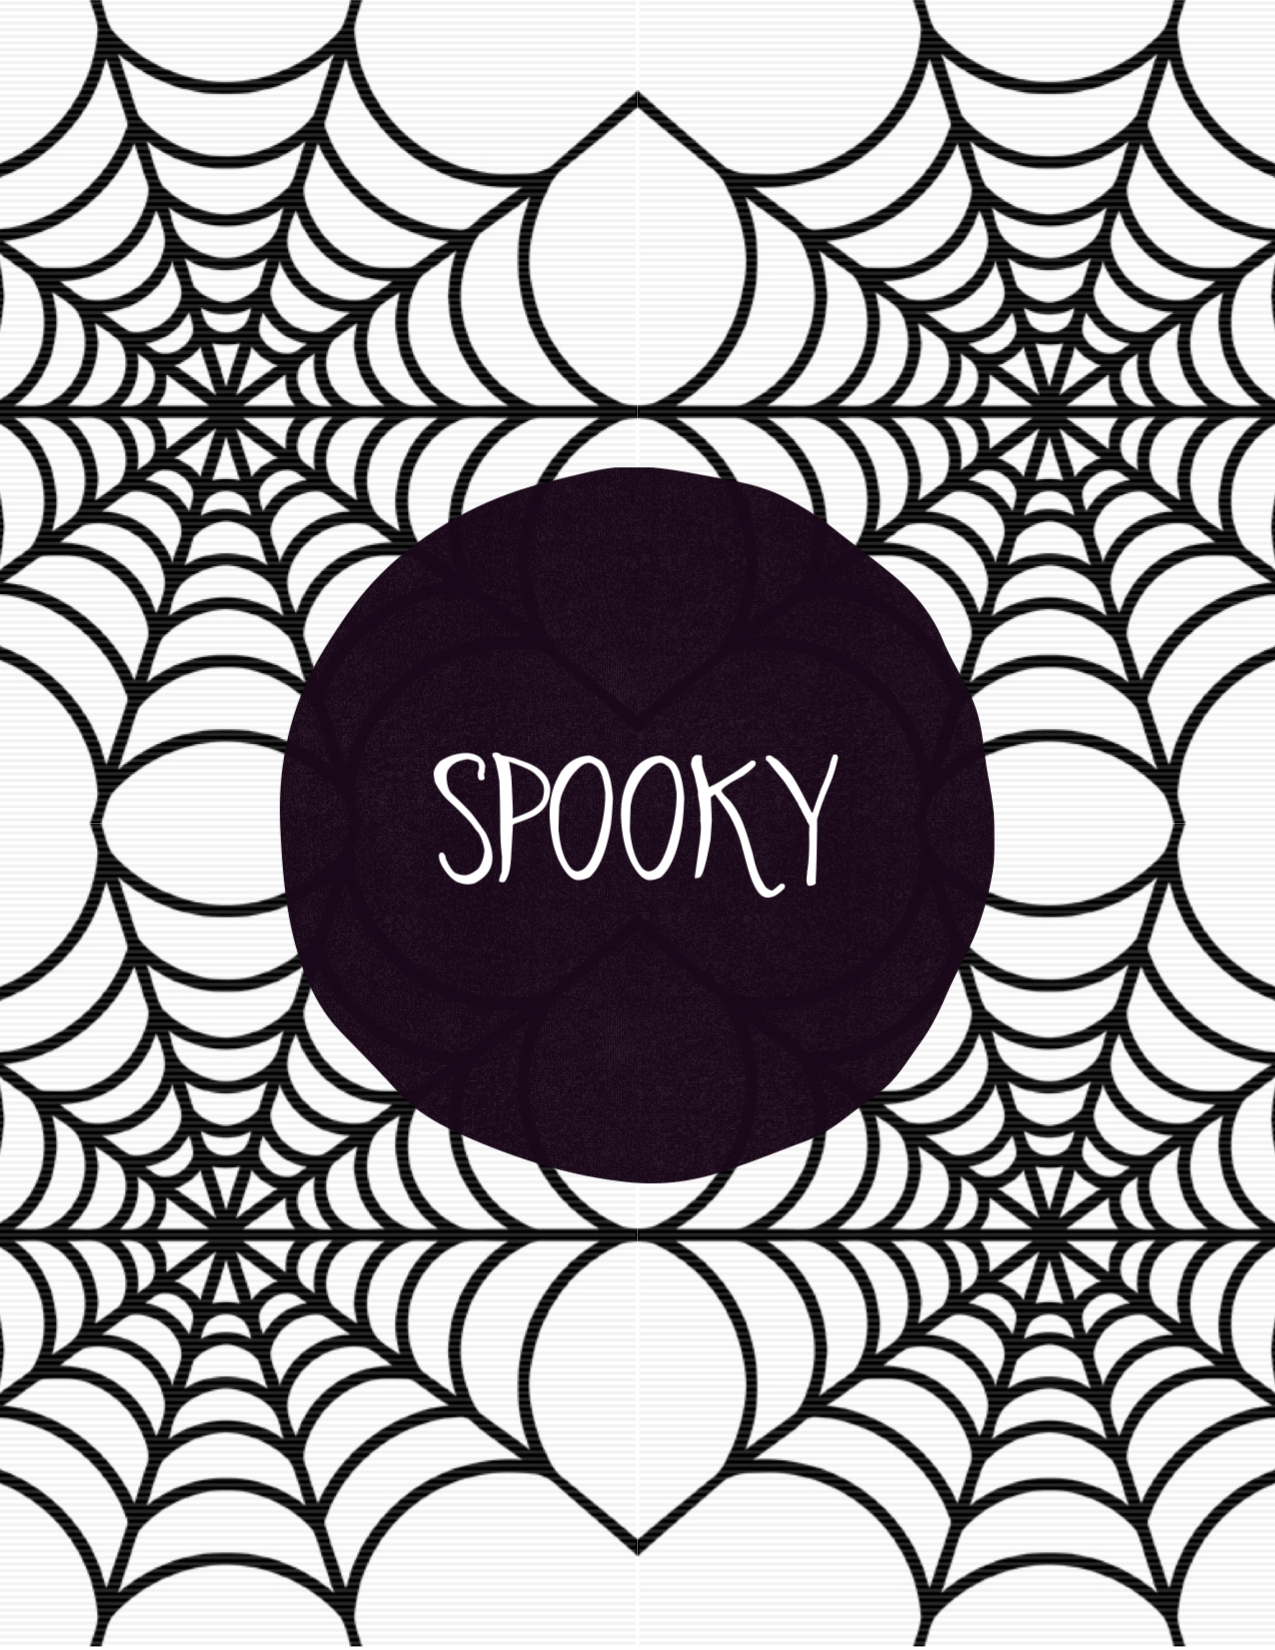 1275x1650 Spooky Halloween Spider Web Free Printable